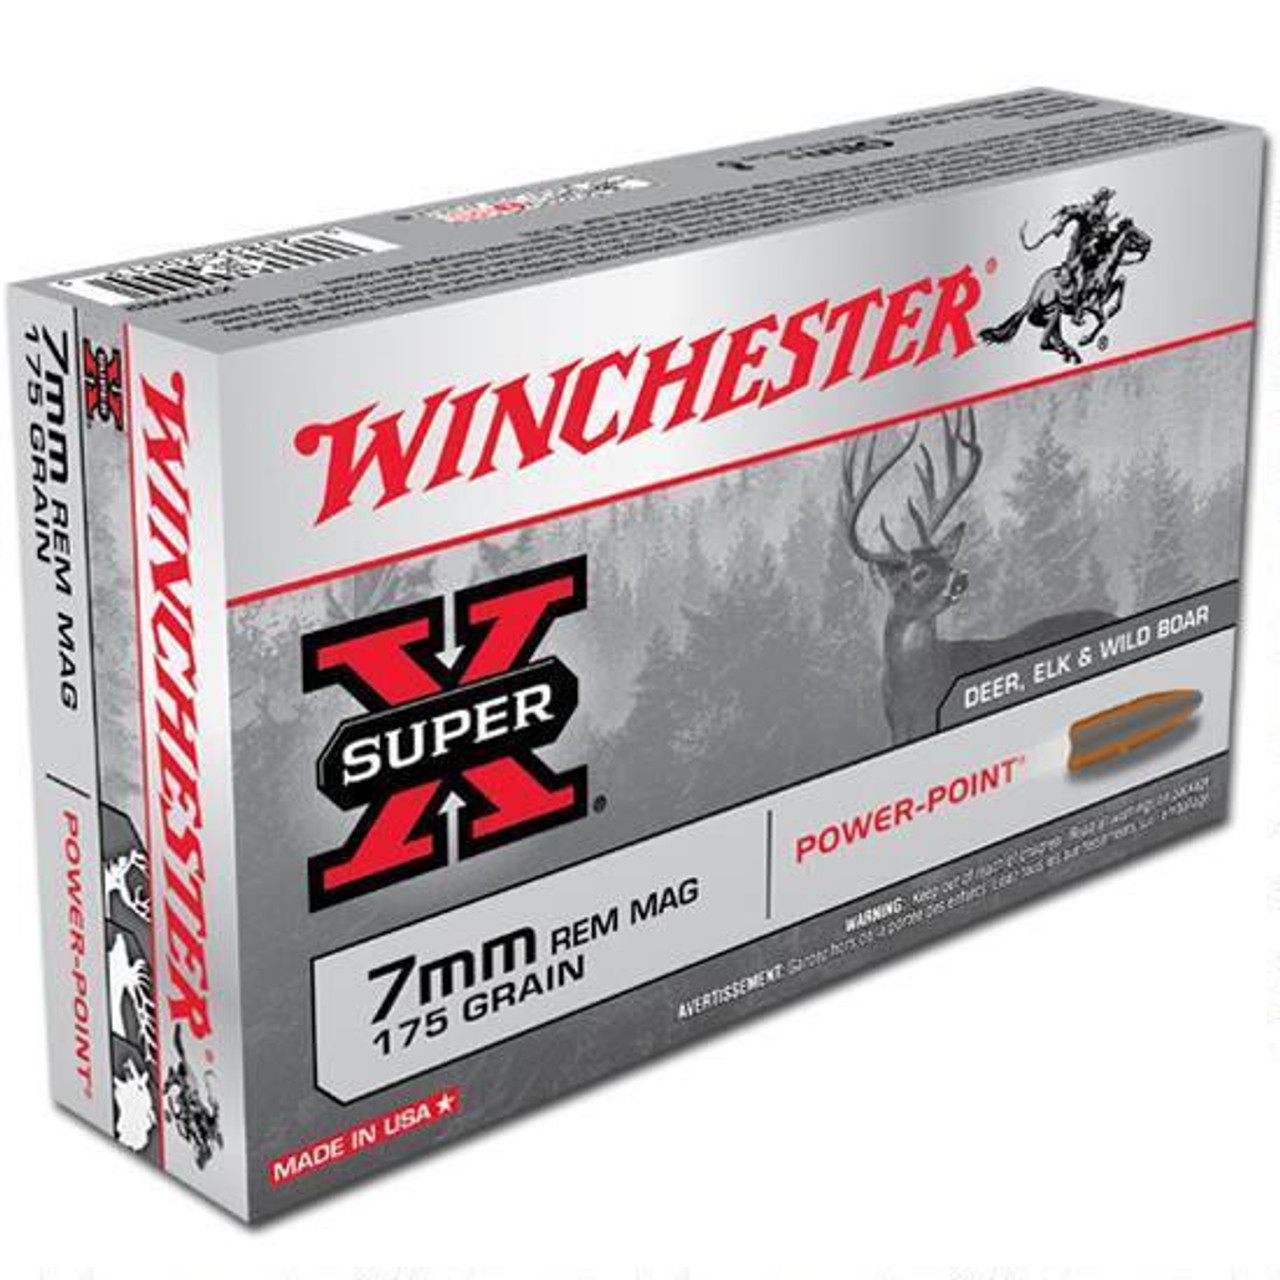 Winchester Super X 7mm Rem Mag, 175 Grain JSP, Box of 20